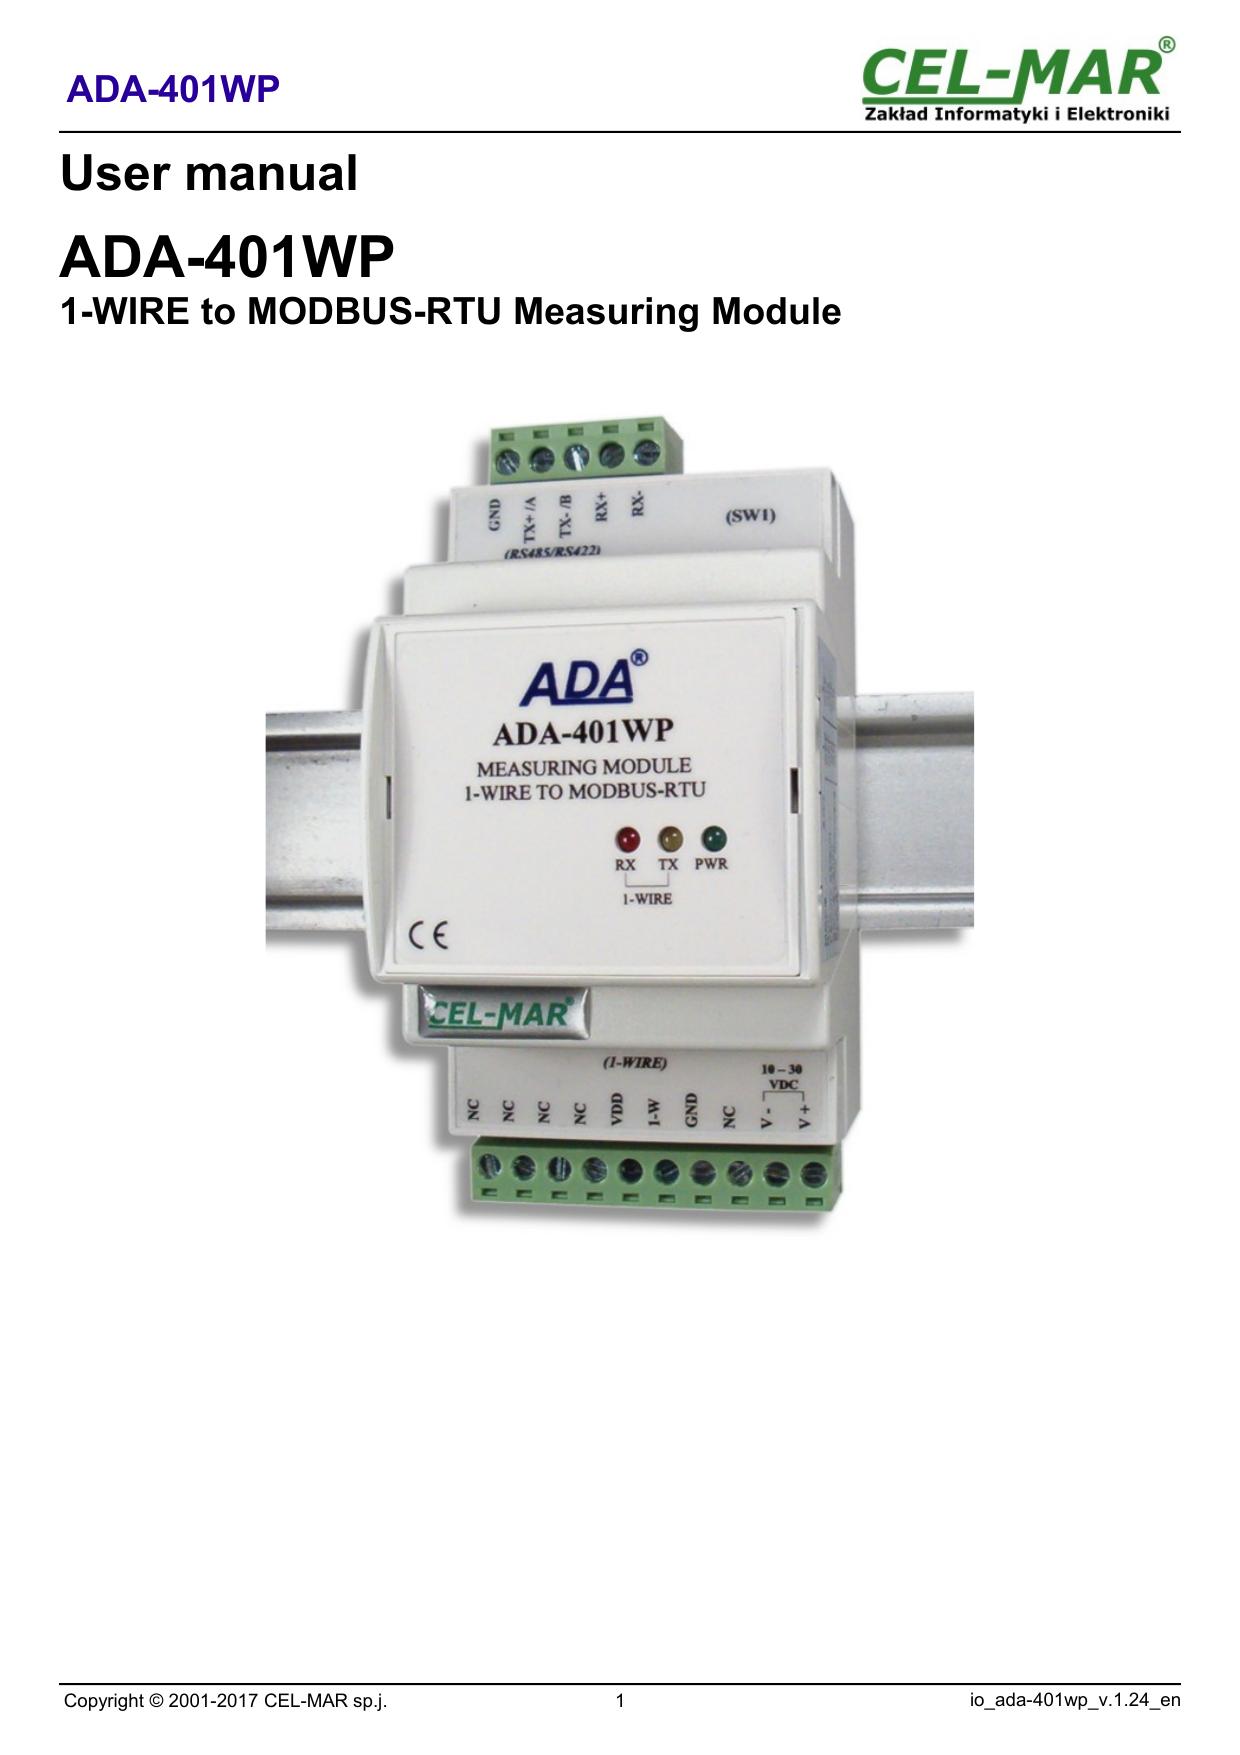 1 Wire To Modbus Rtu Measuring Module Ada 401wp Cel Mar Wiring